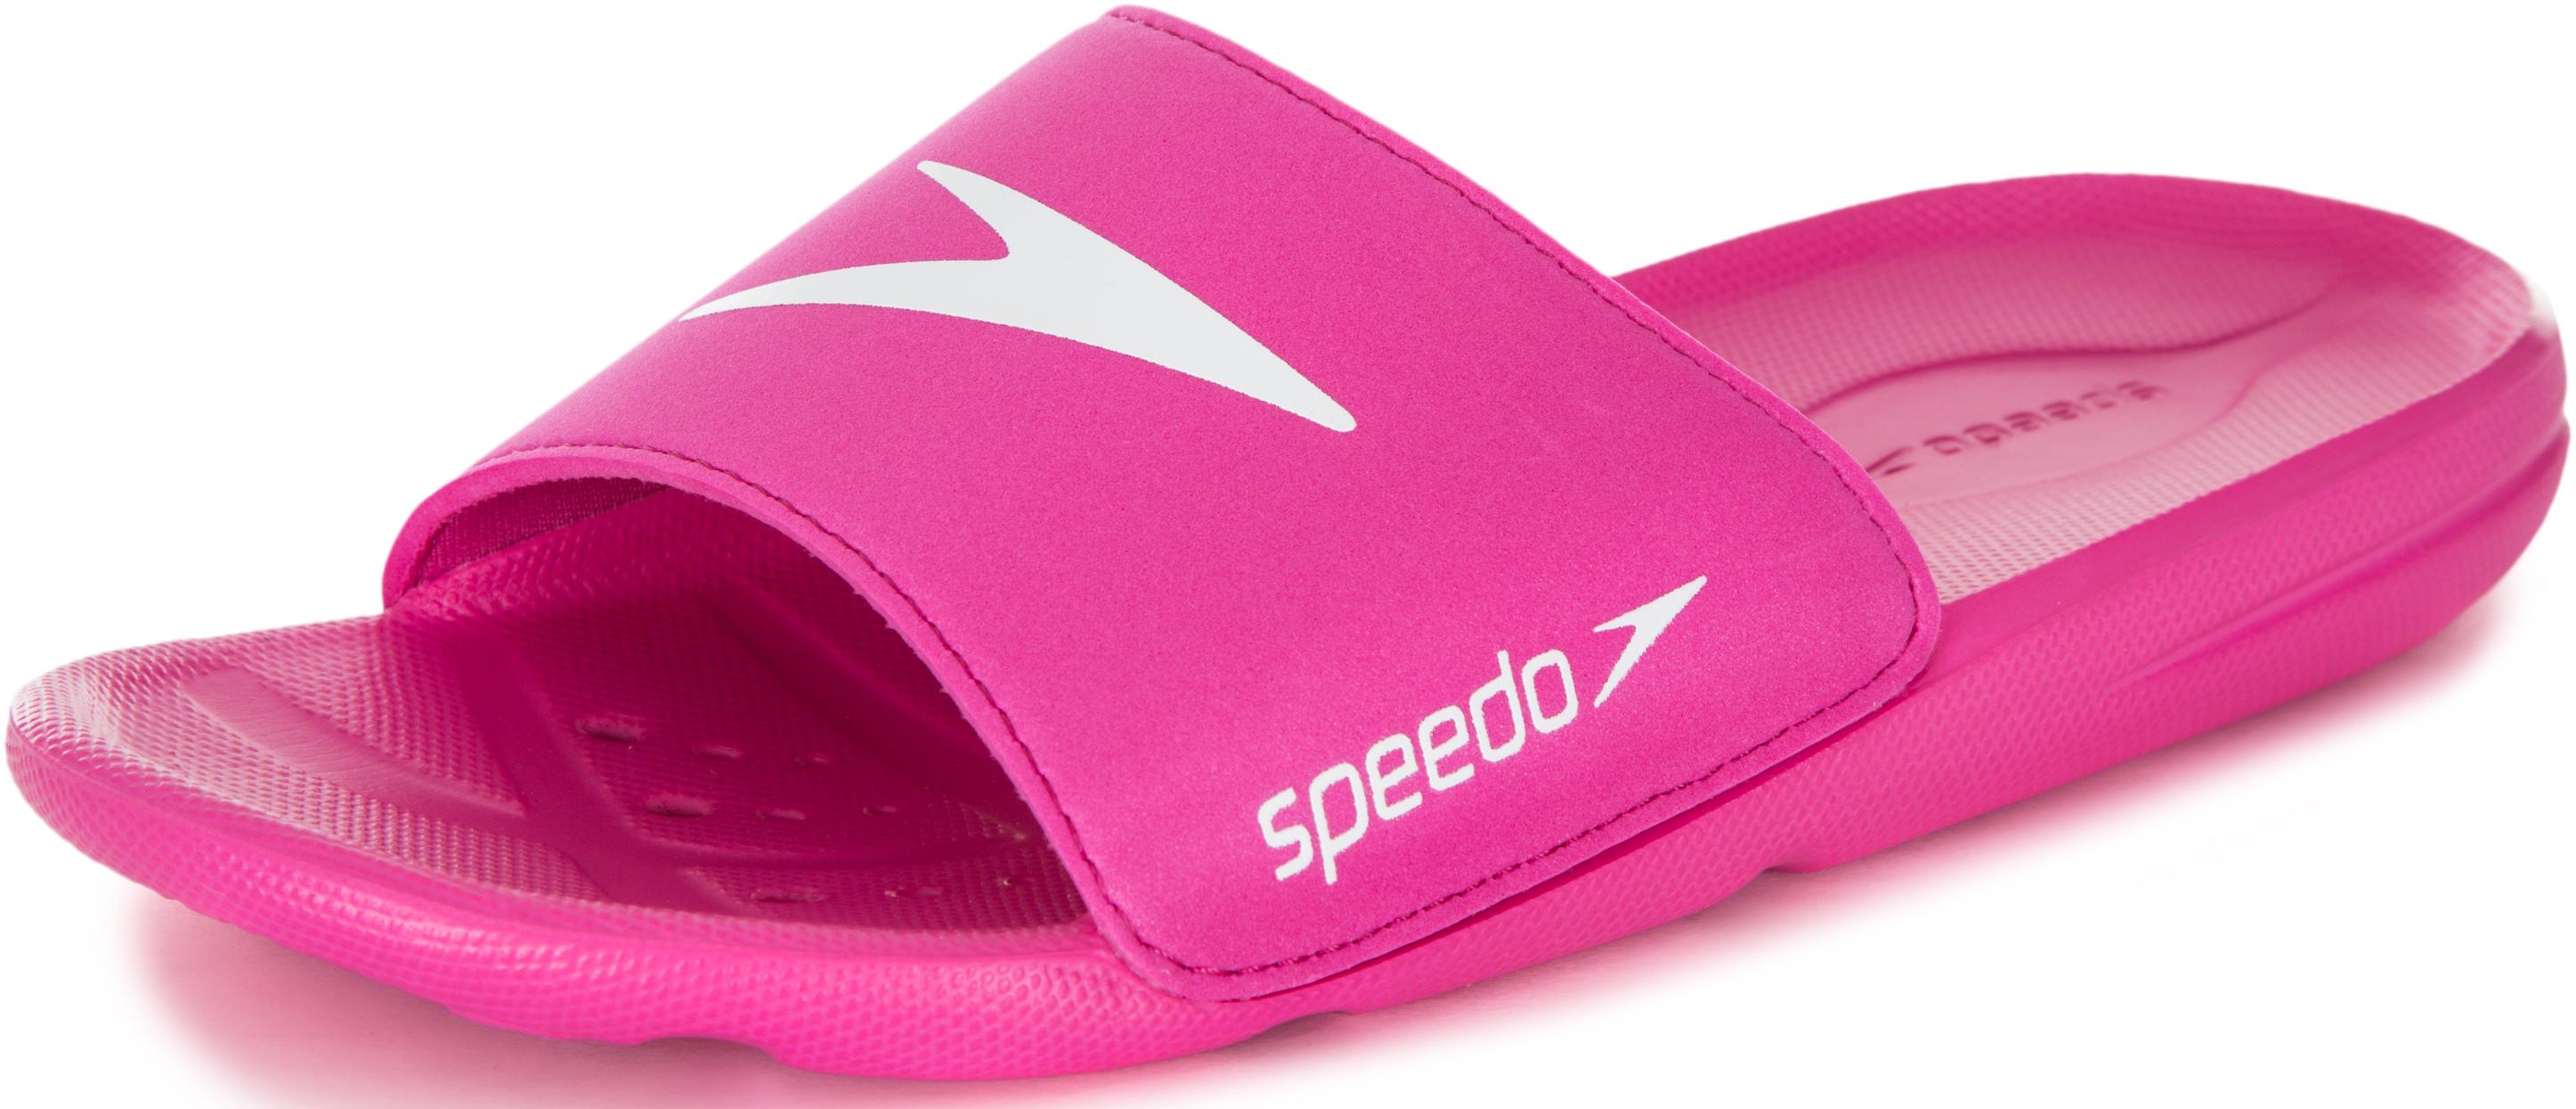 Speedo Шлепанцы для девочек Speedo, размер 37-38 цена